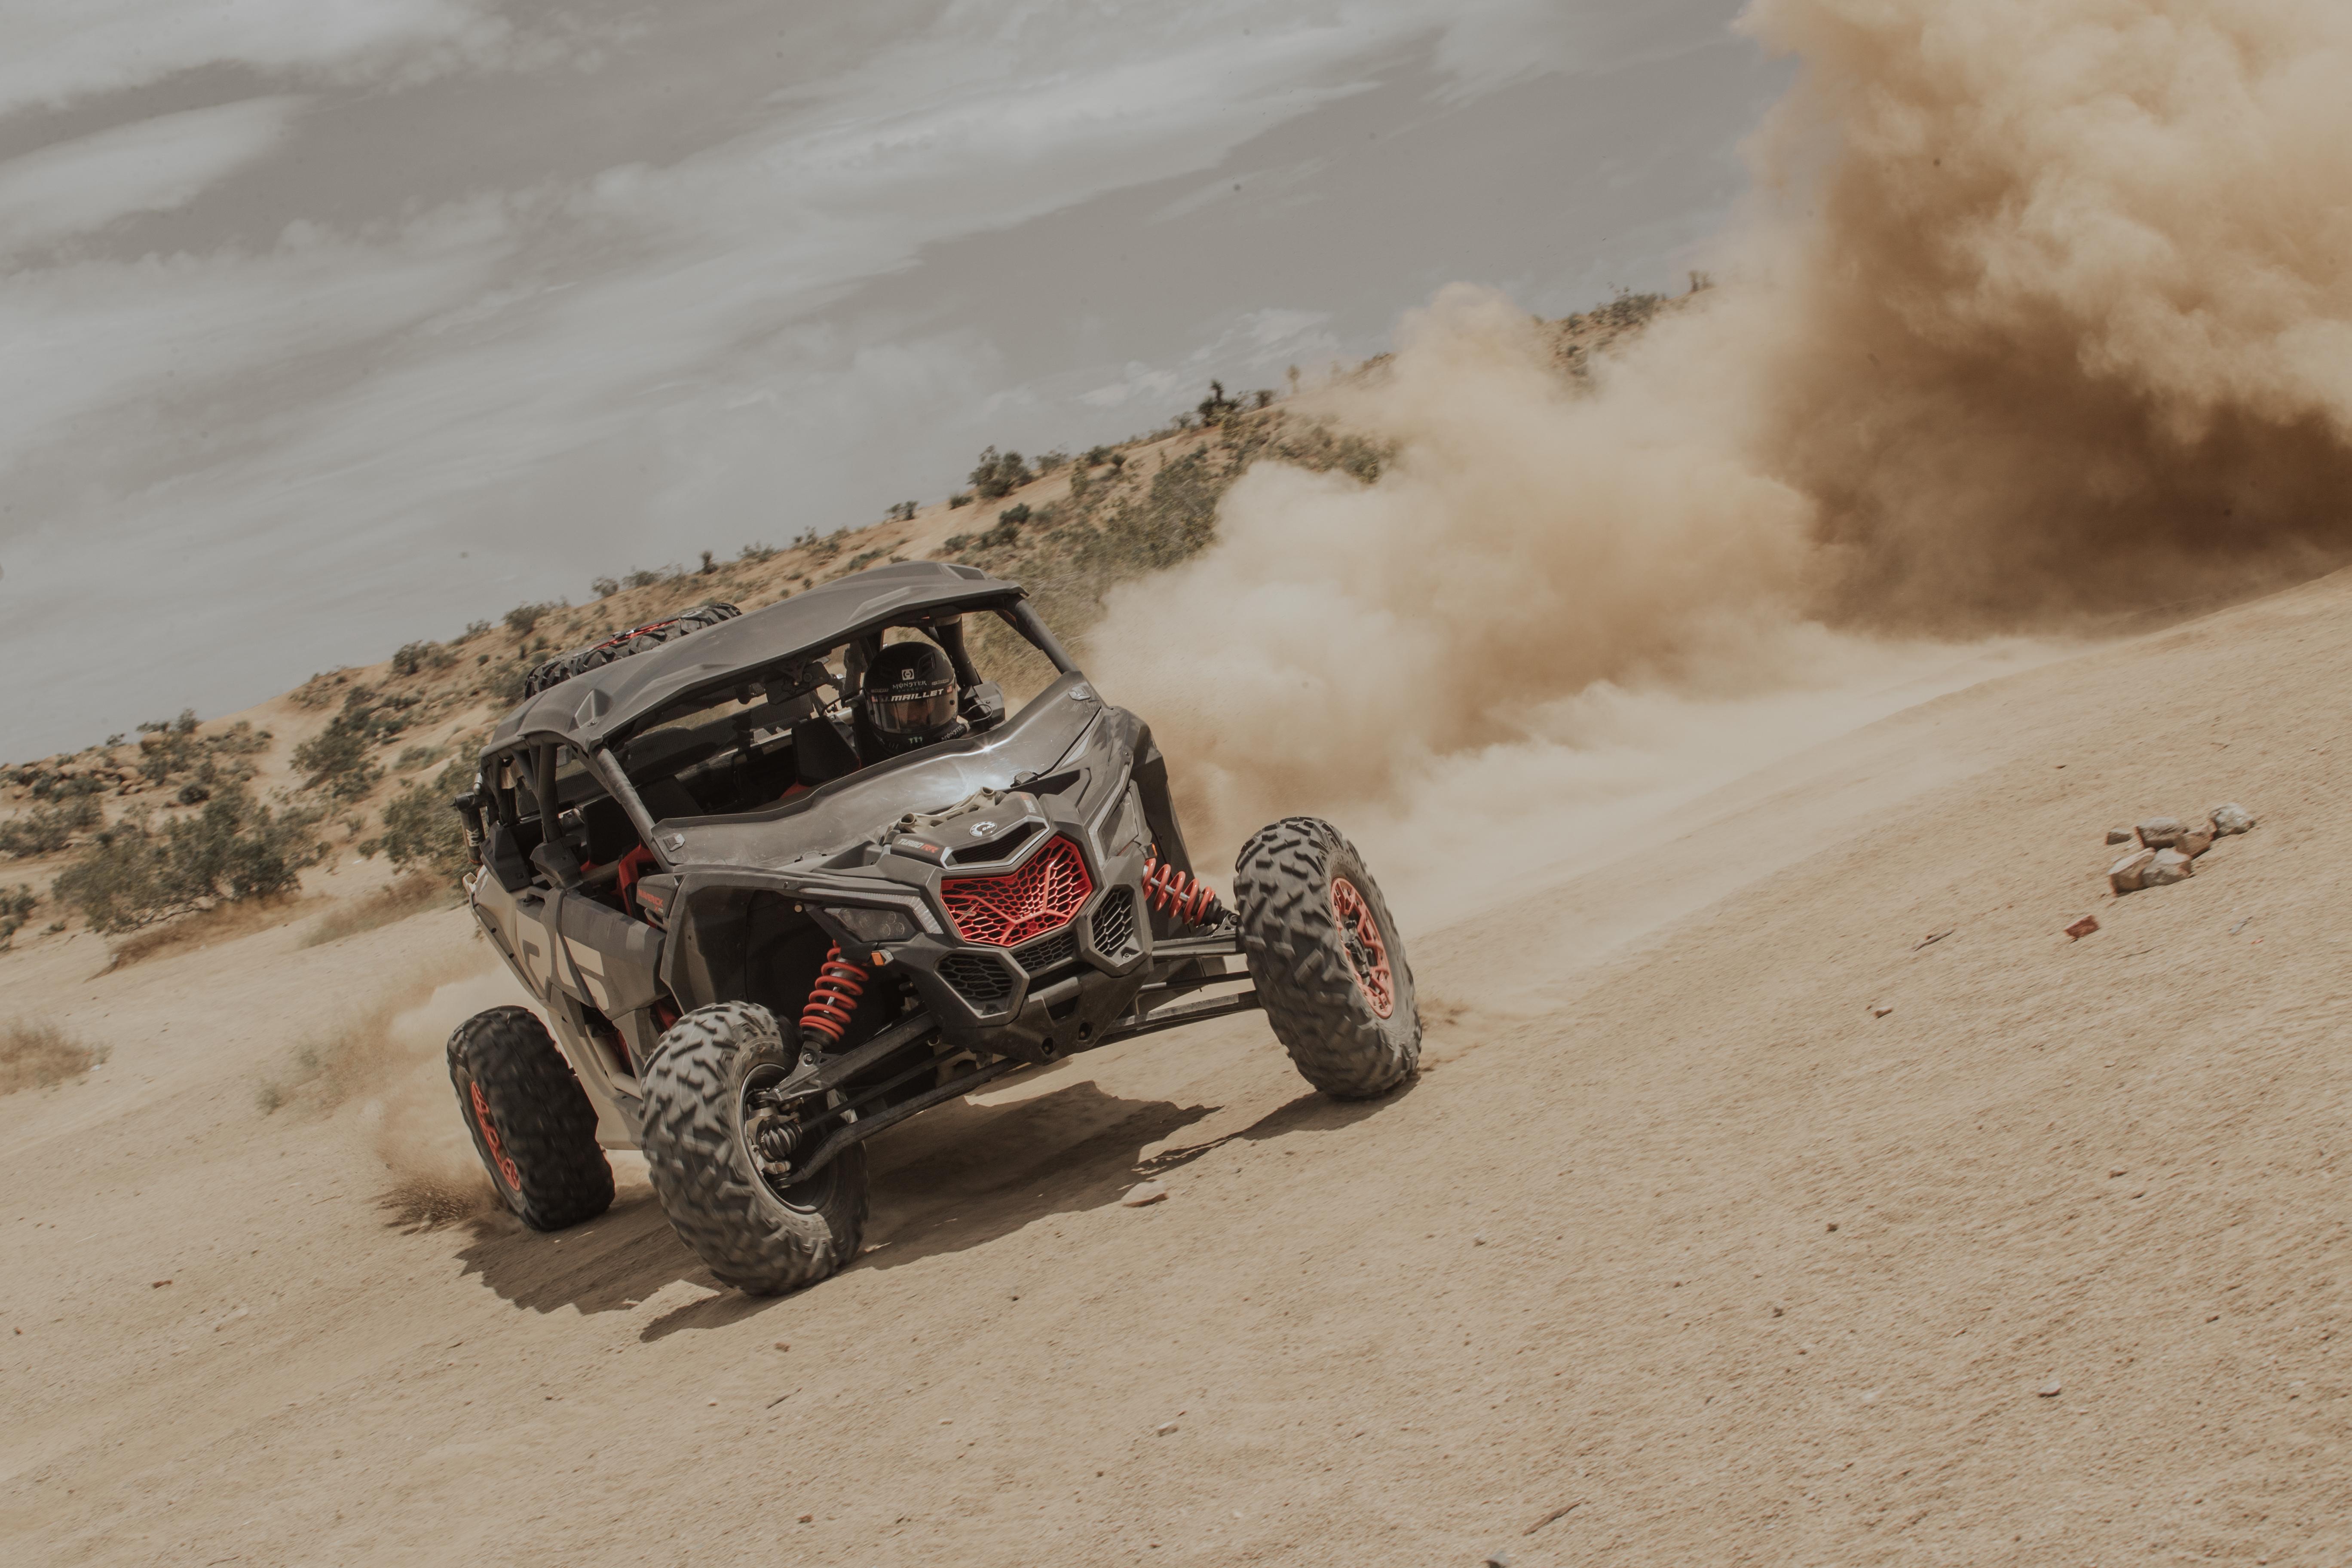 2021 Can-Am Maverick X3 X rs Turbo RR